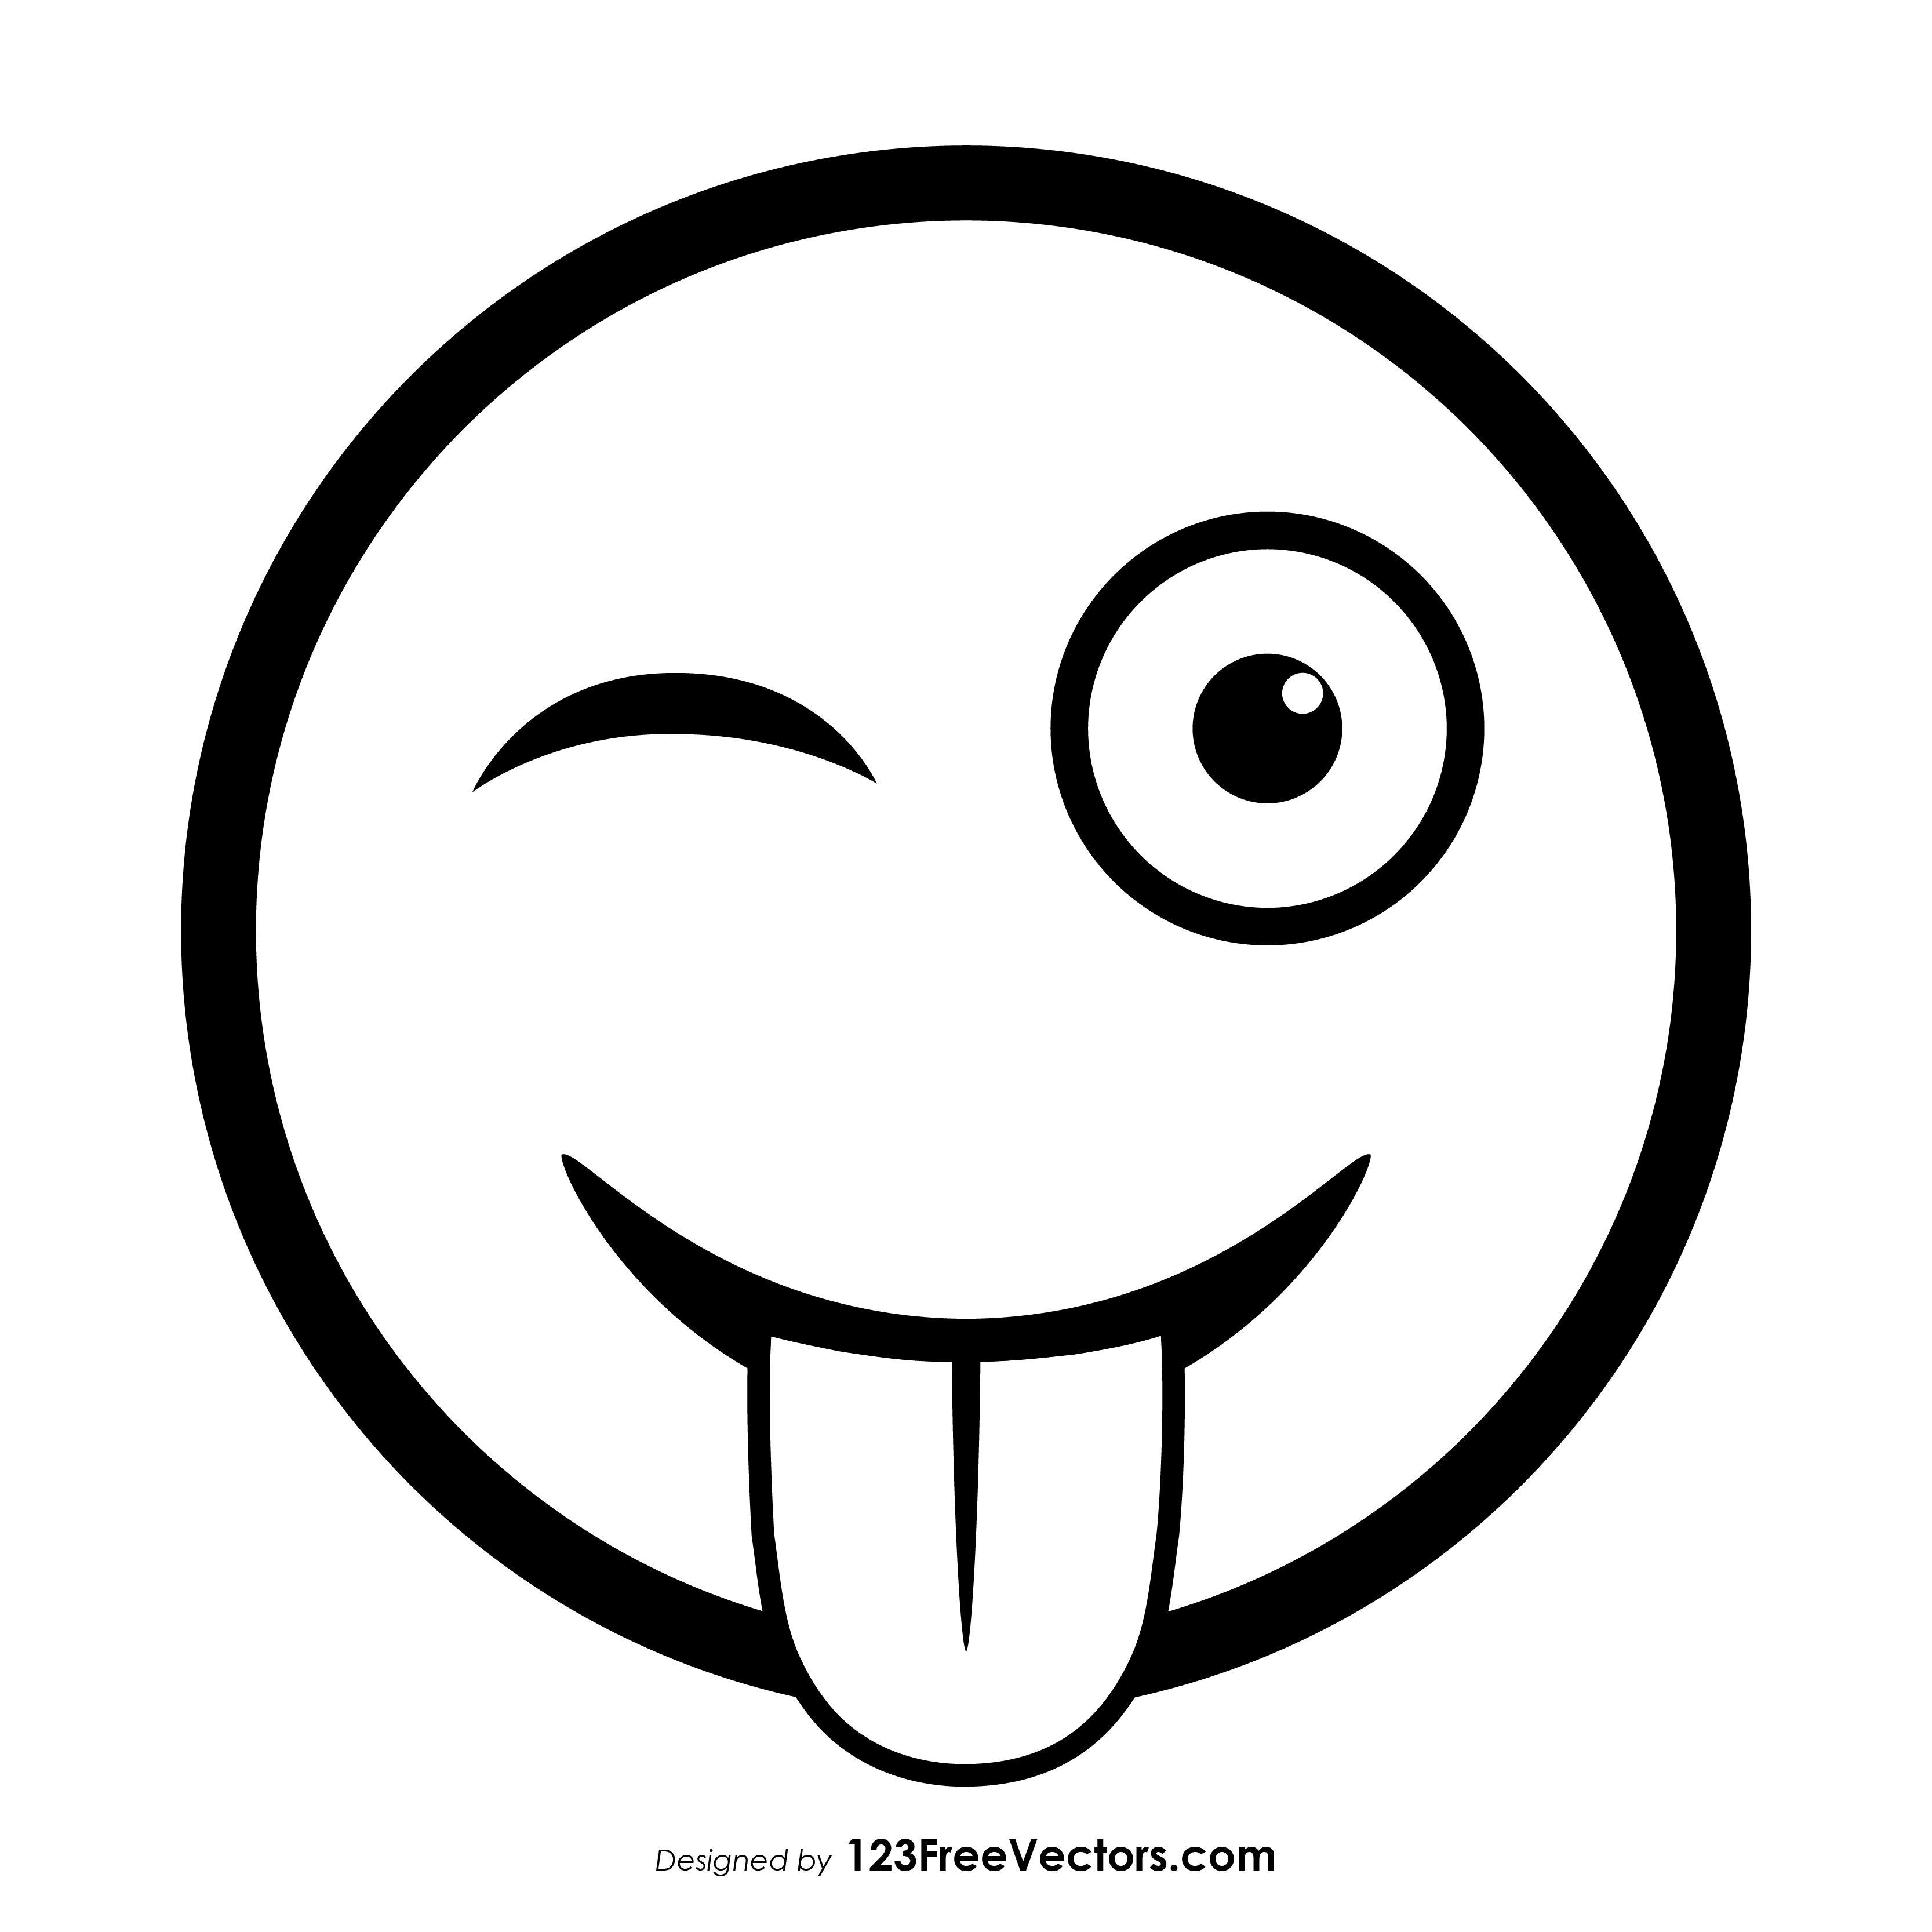 Winking Face With Tongue Emoji Outline In 2021 Emoji Art Emoji Coloring Pages Emoji Drawings